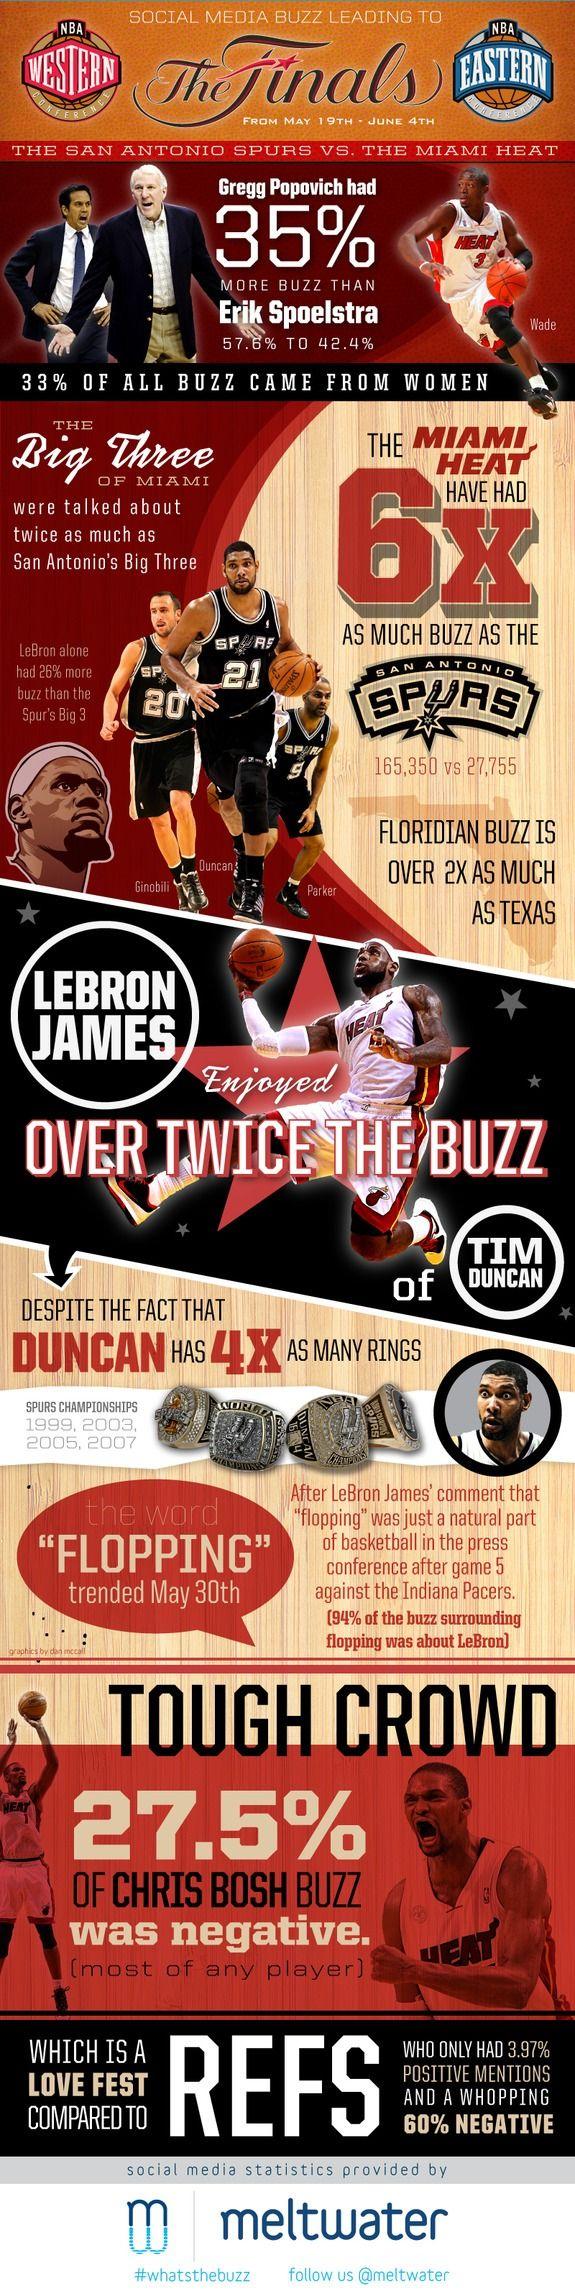 La batalla viral 2.0 entre Spurs vs Miami Heat en la final de la @NBA | #digisport #nba #basket